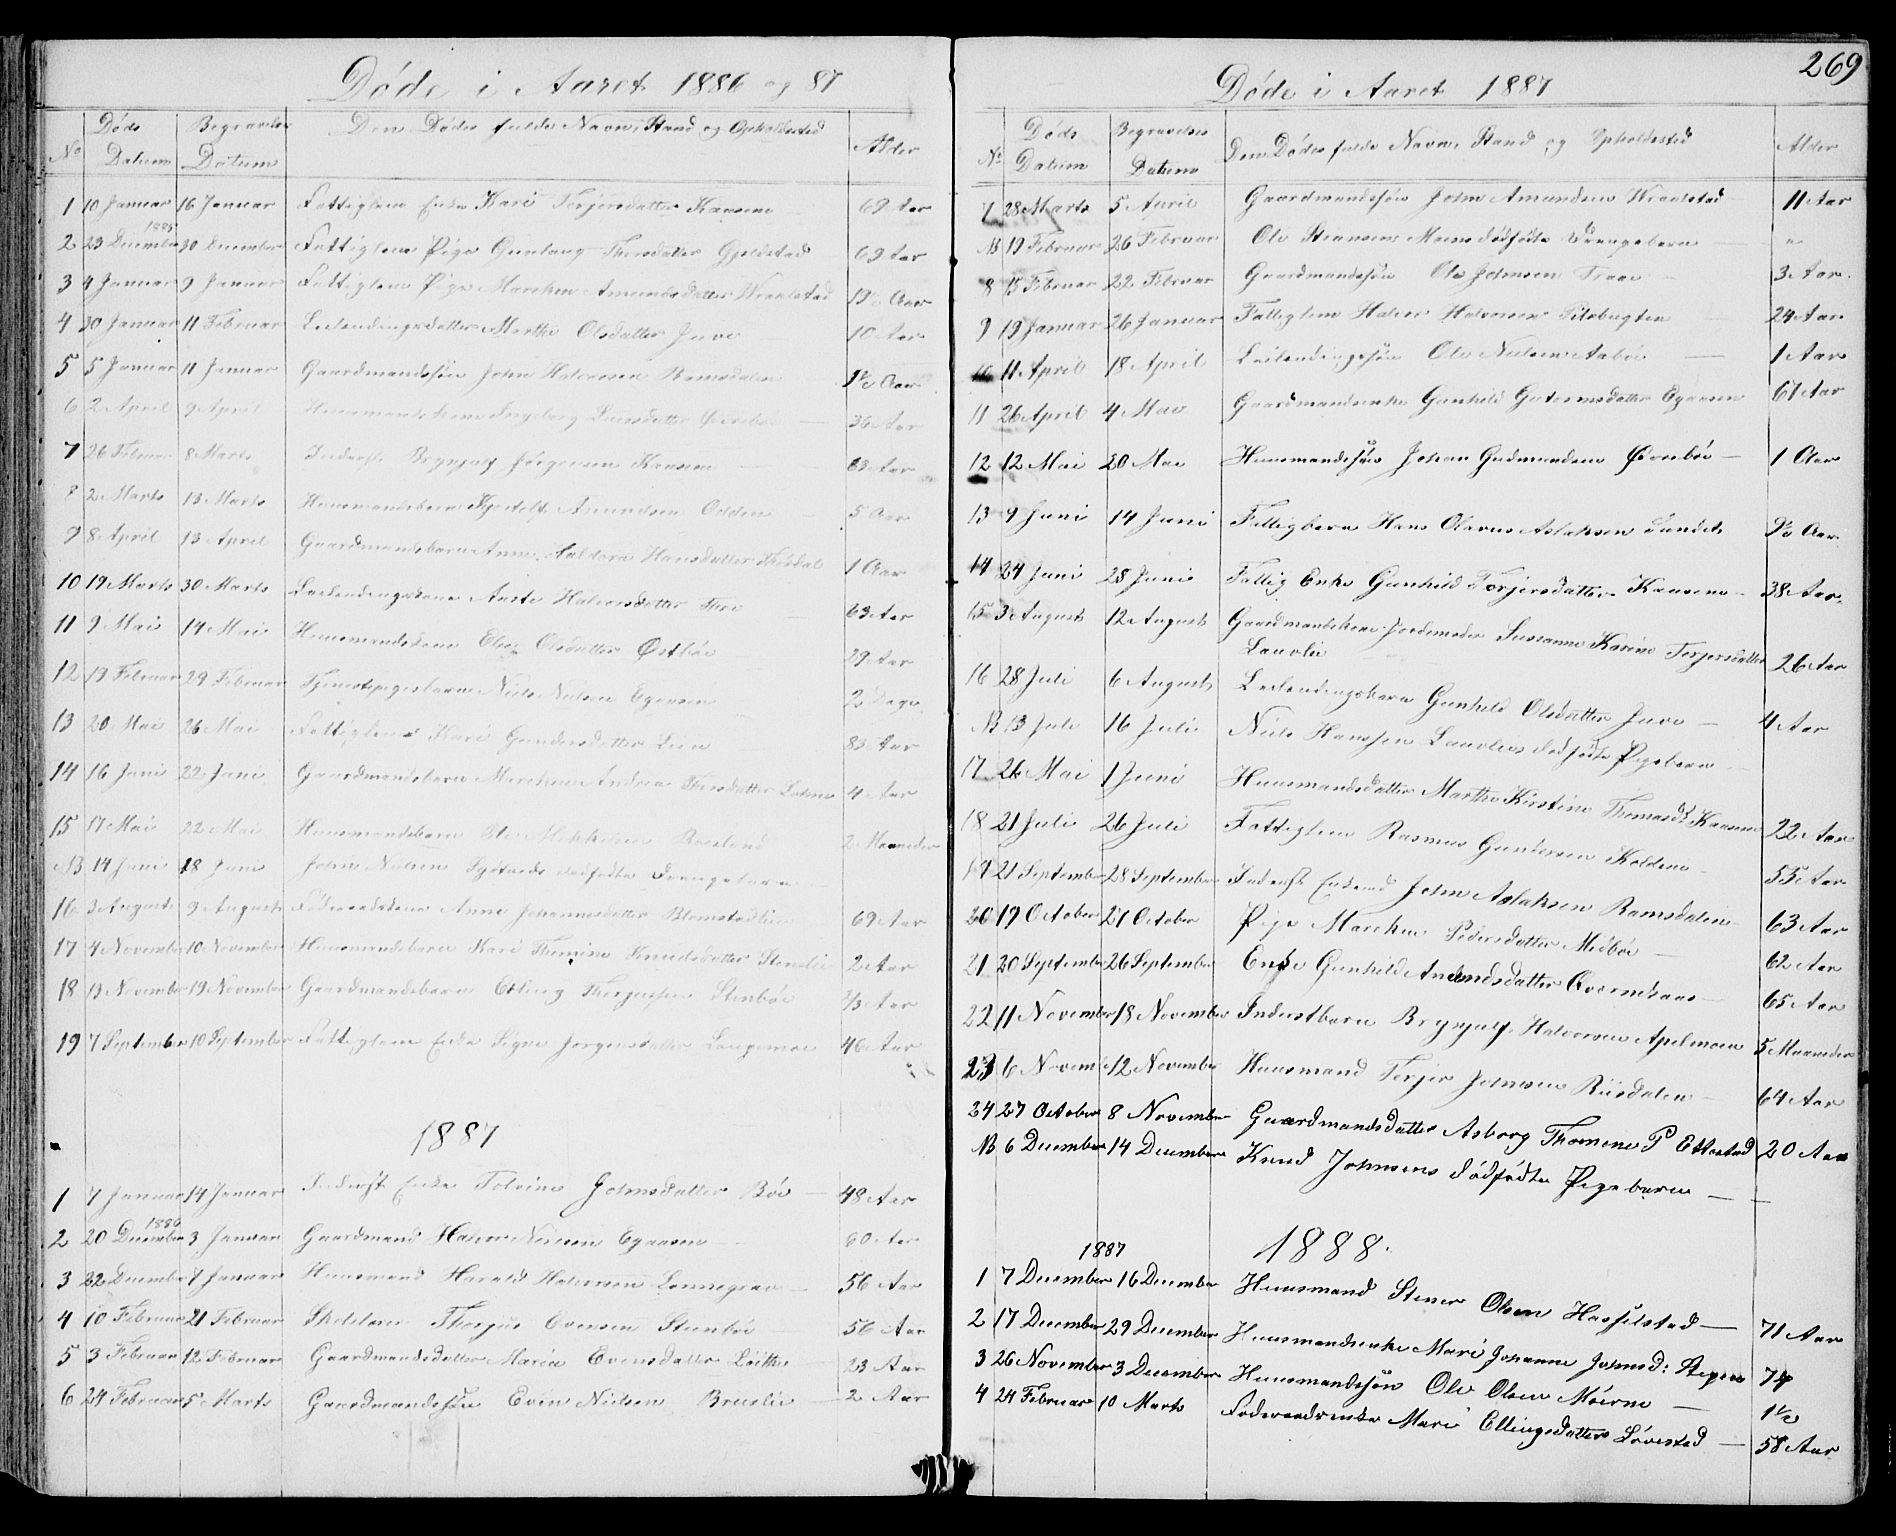 SAKO, Drangedal kirkebøker, G/Gb/L0001: Klokkerbok nr. II 1, 1856-1894, s. 269